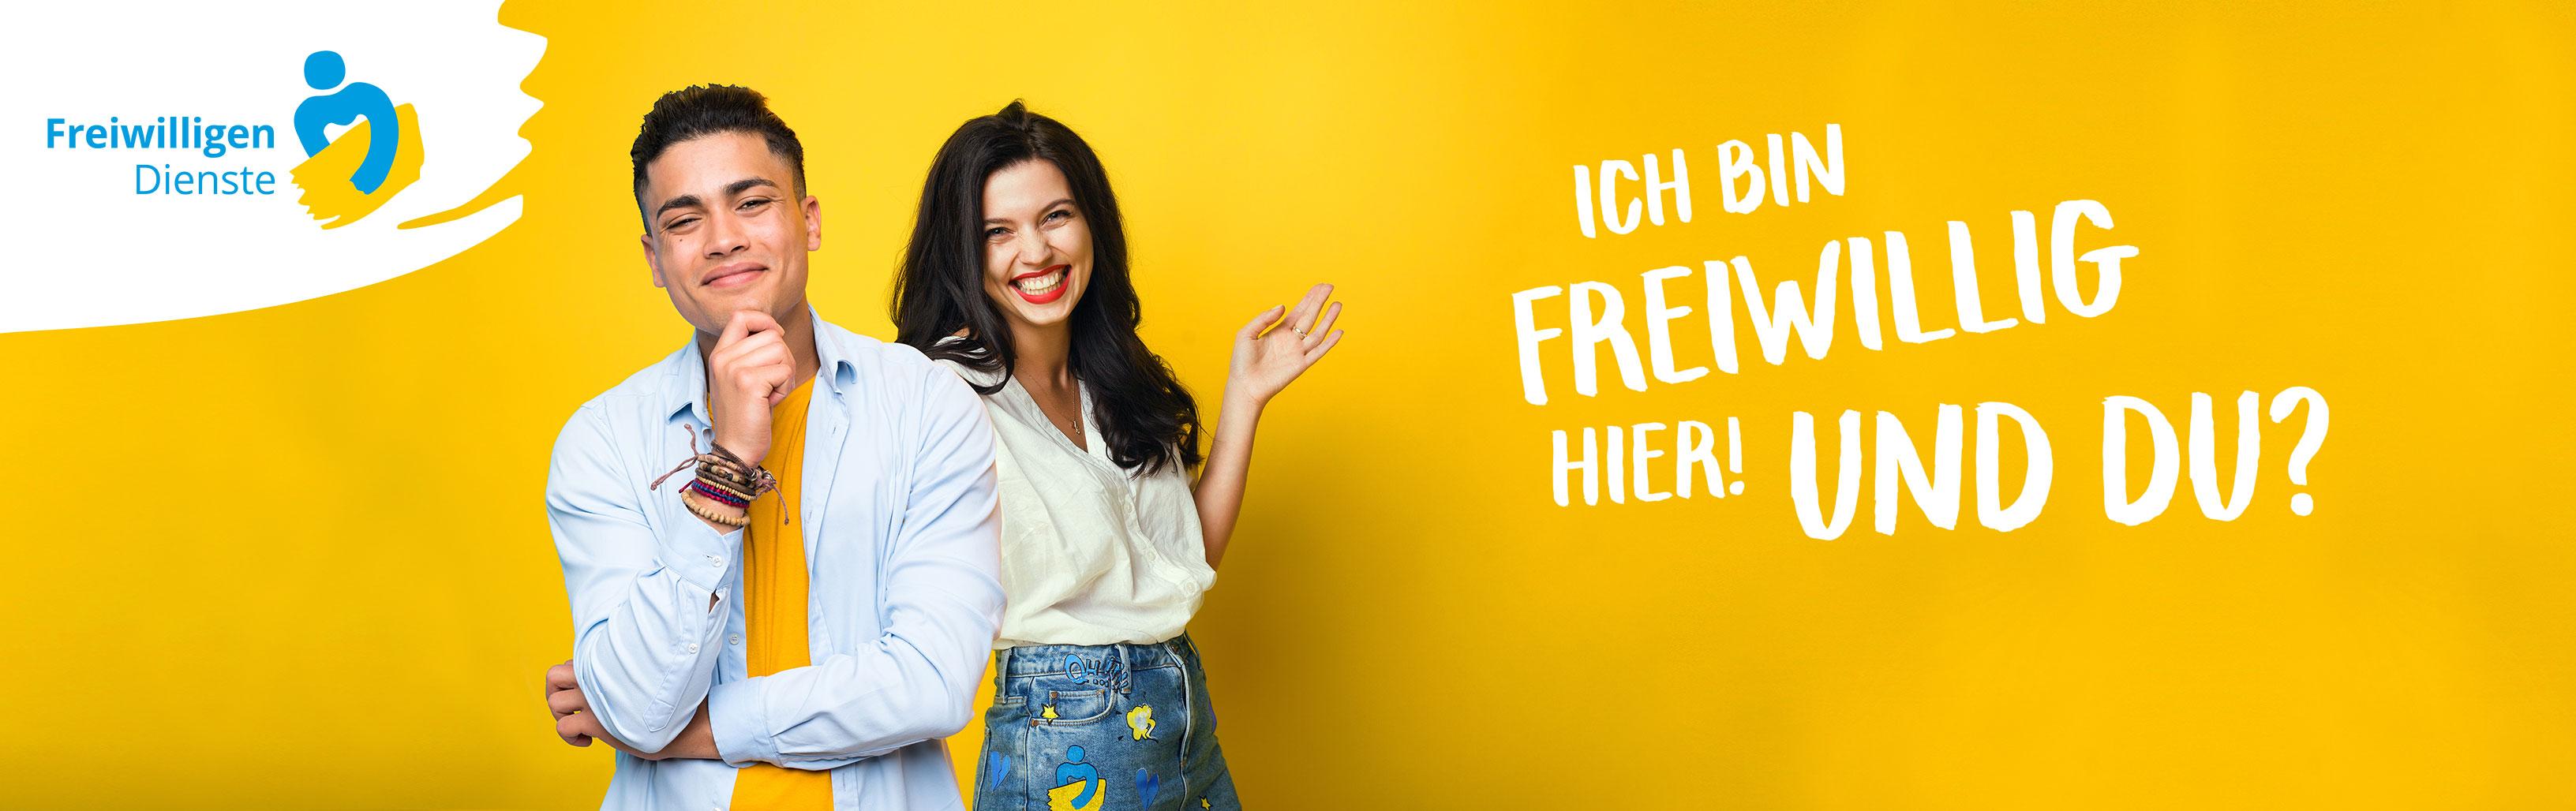 upload/IB/VB_Nord/Schleswig-Holstein/FWD/Web_IB_FWD_Header_2.jpg